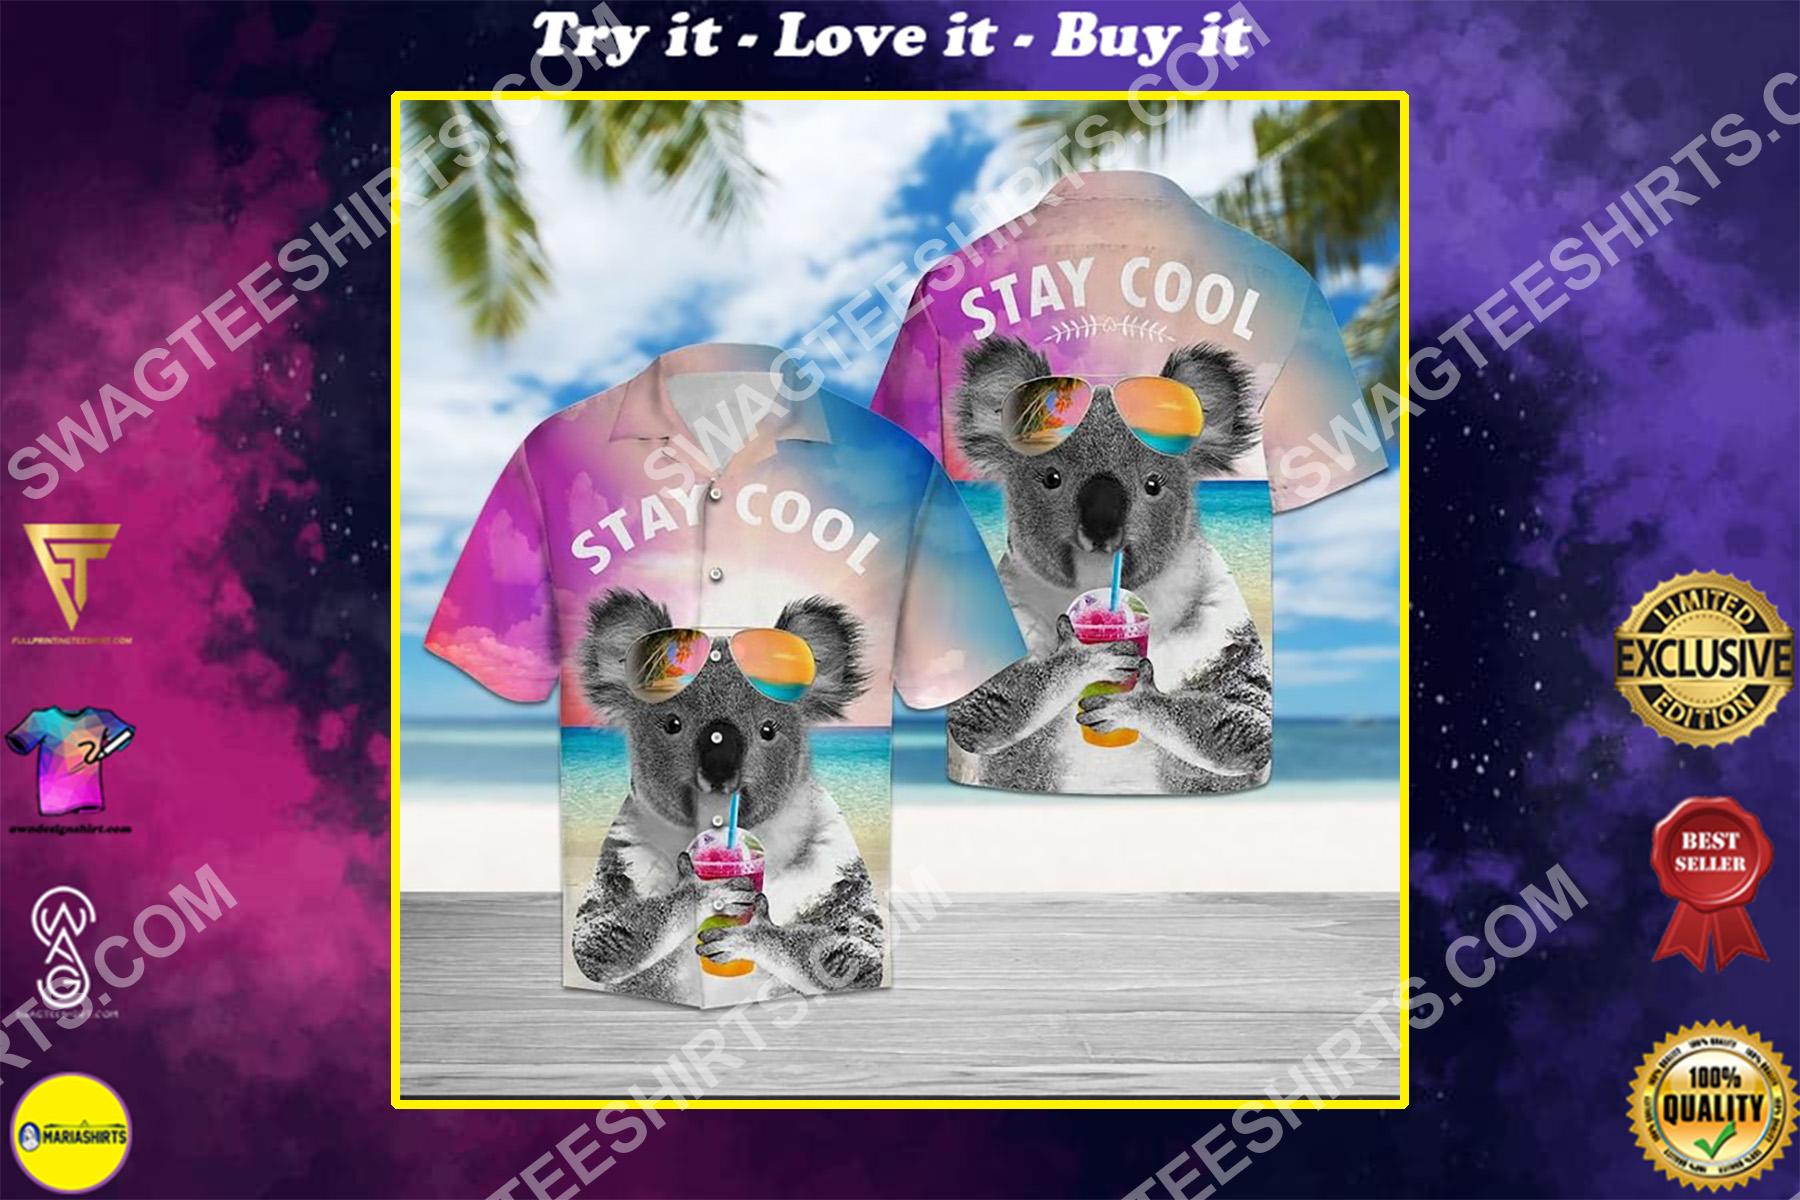 koala stay cool all over printed hawaiian shirt